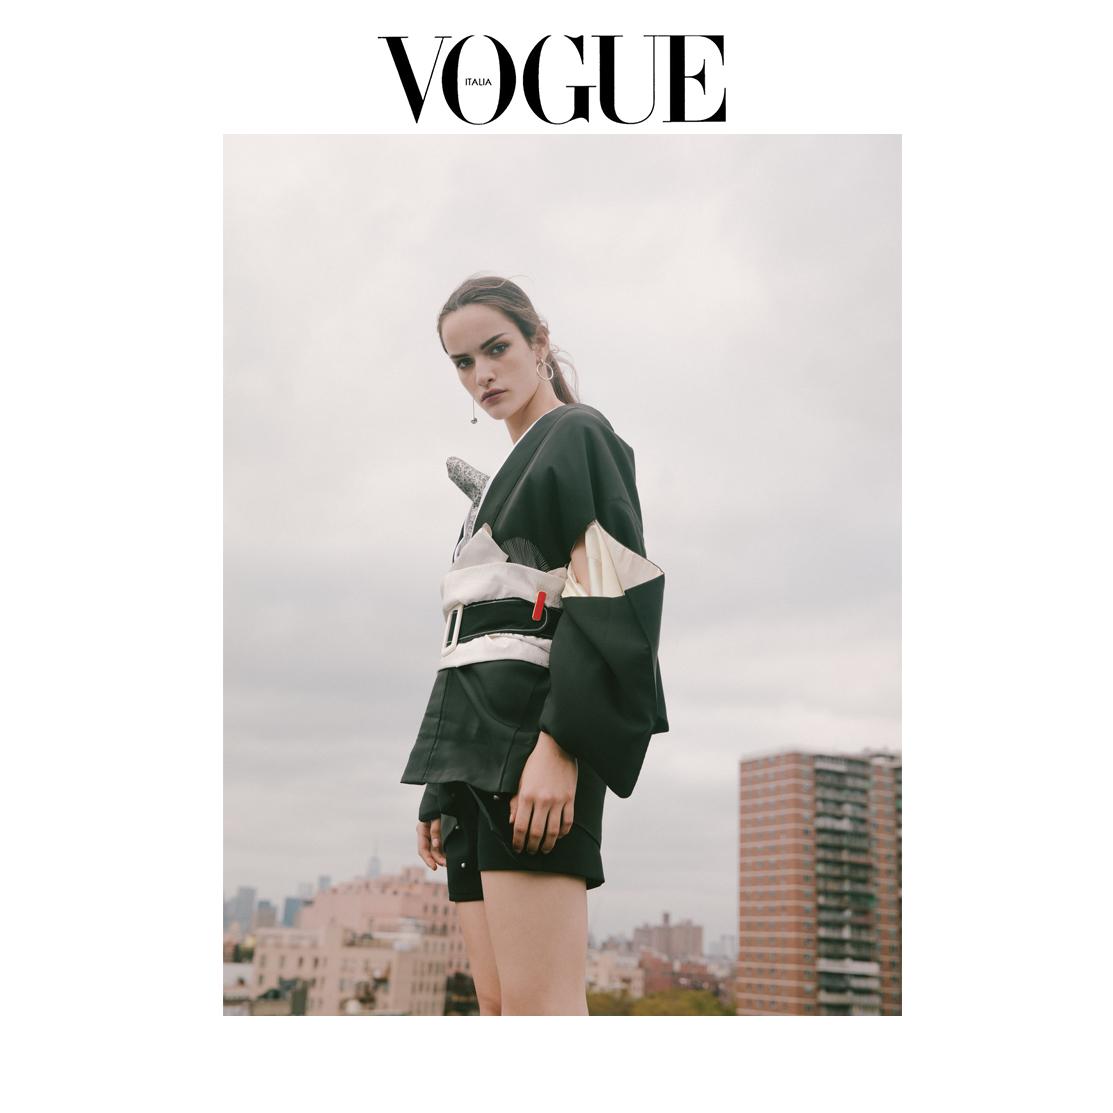 Vogue 22  copy.jpg